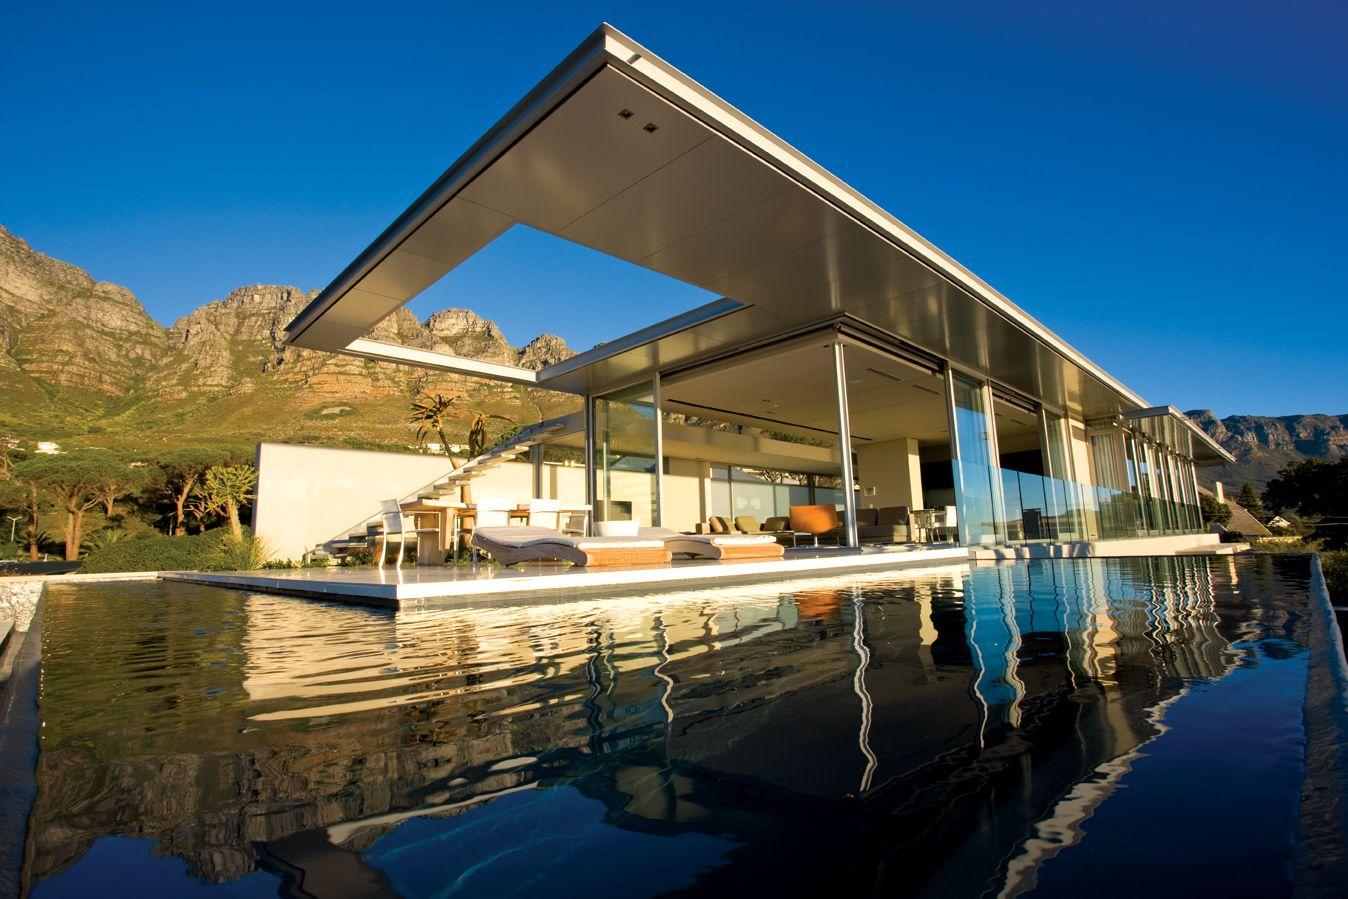 South Africa's Icon Villas. Luxury vacation rentals